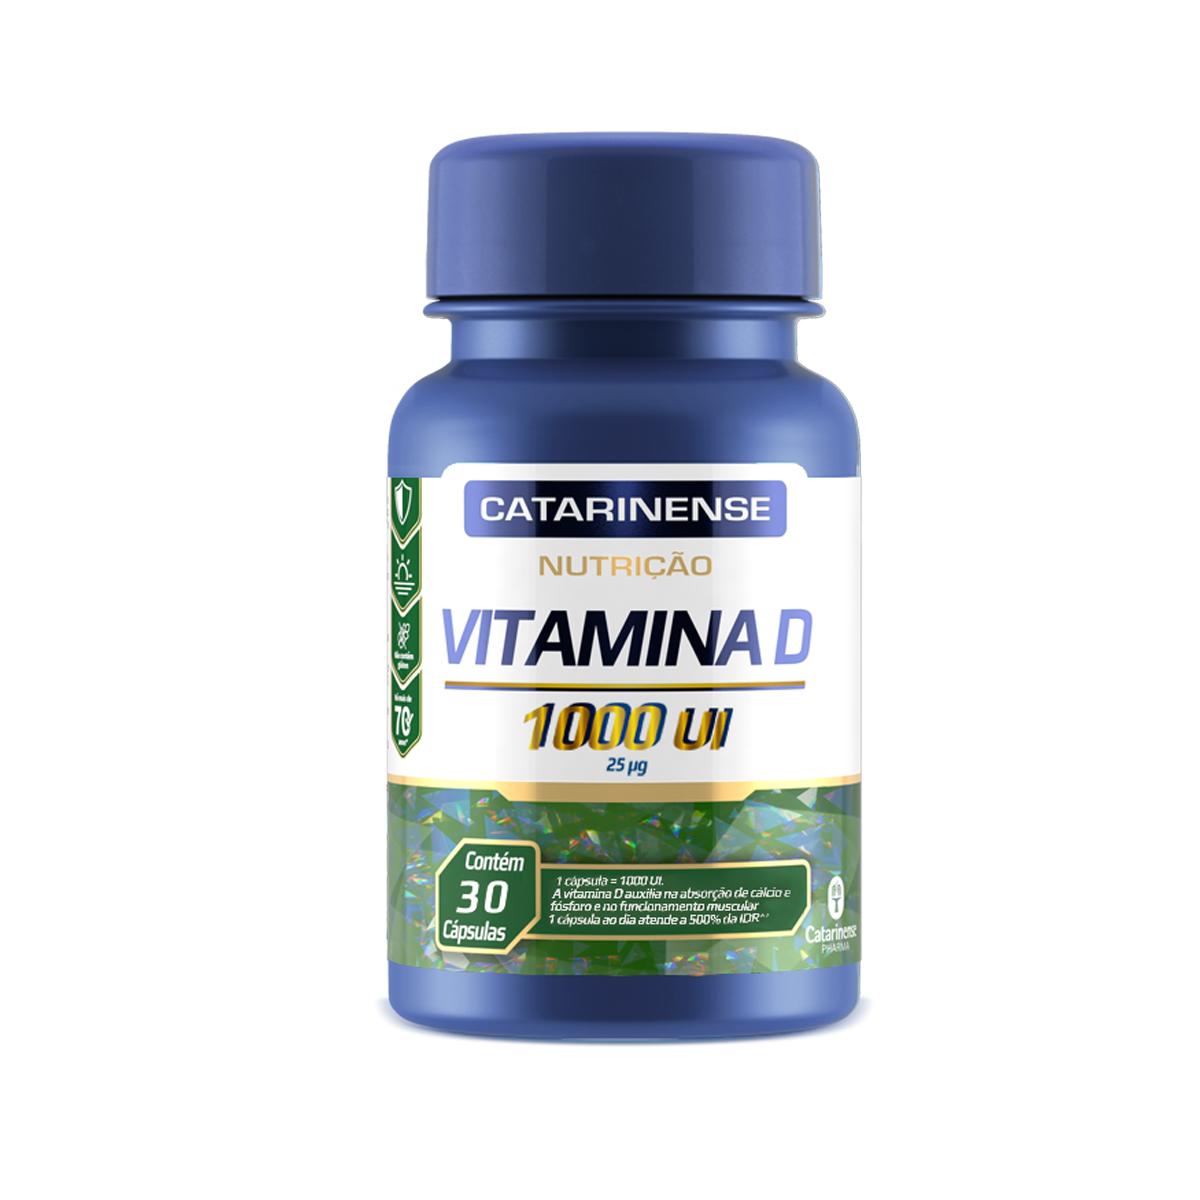 Vitamina D 1000 UI 30 Cápsulas - Catarinense